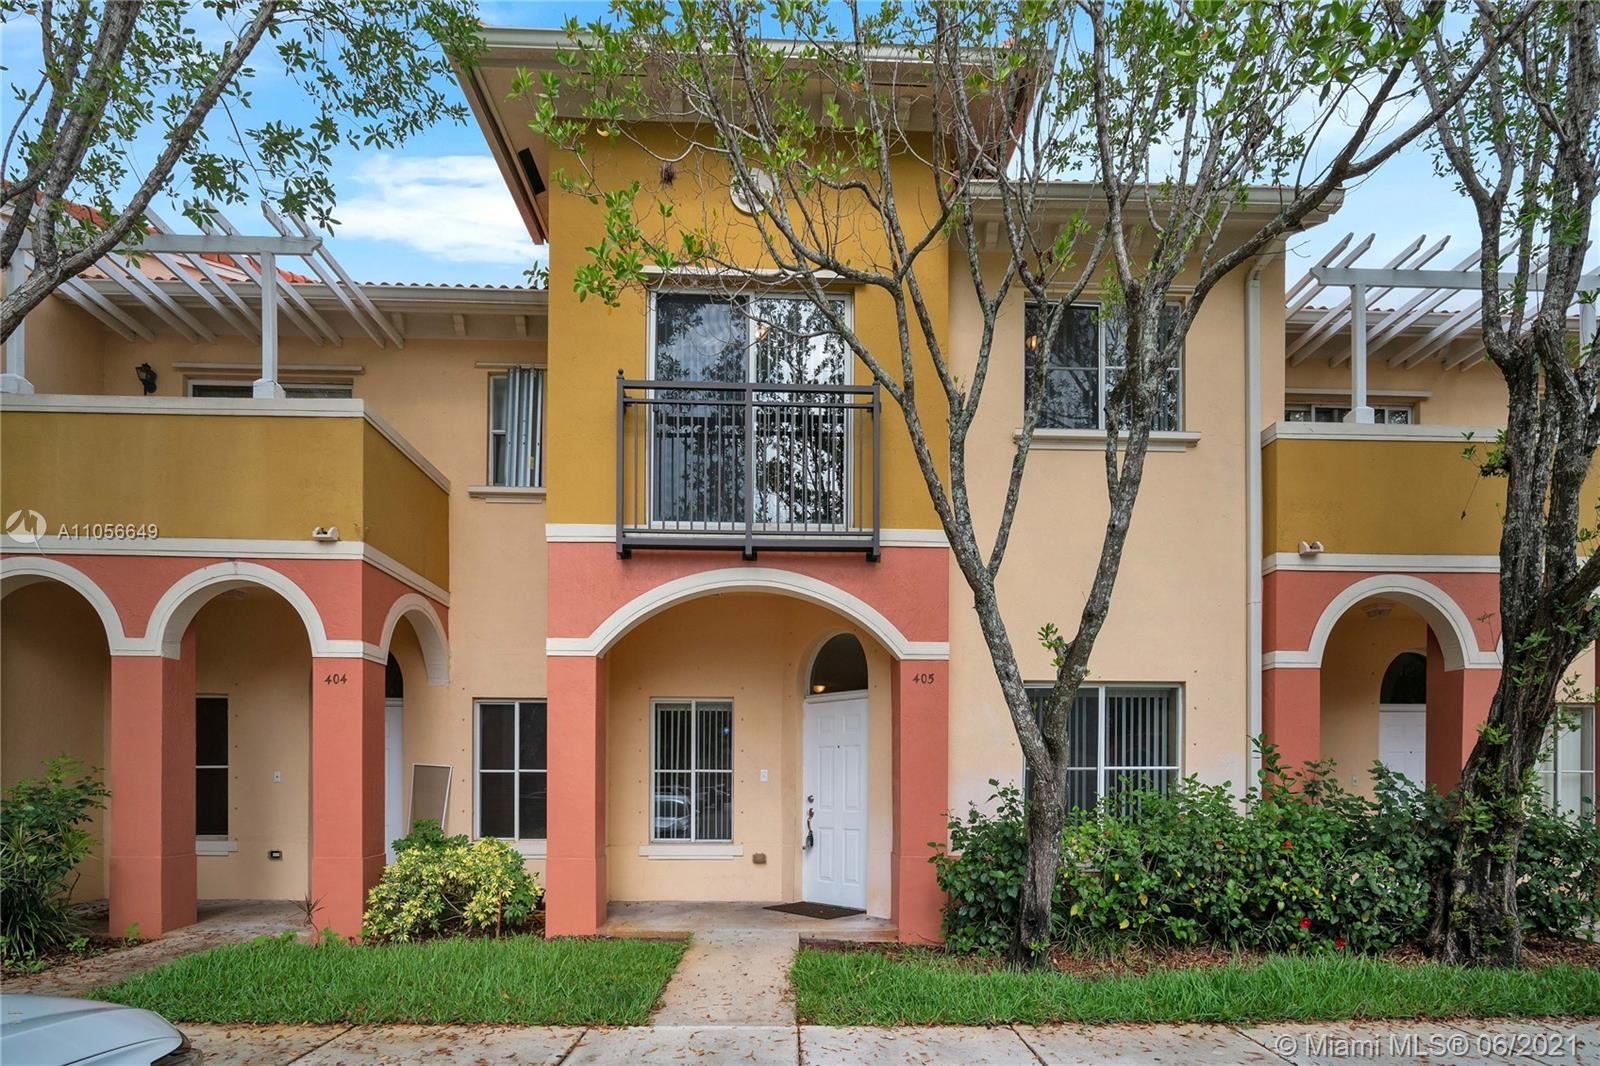 405 W Santa Catalina Cir #405, North Lauderdale, FL 33068 - #: A11056649